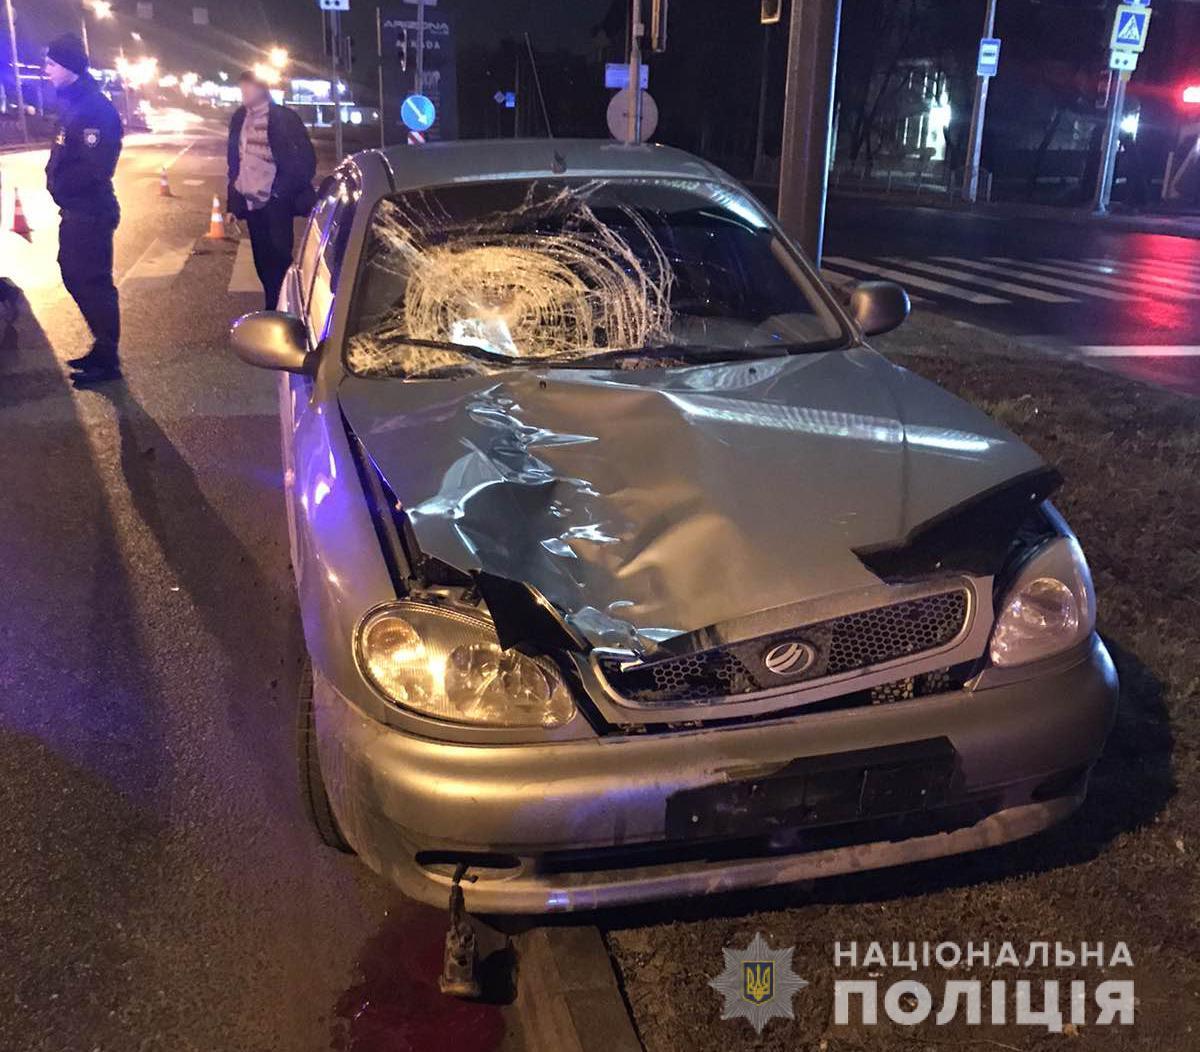 За рулем Daewoo был 55-летний мужчина / фото Нацполиции Харьковщины